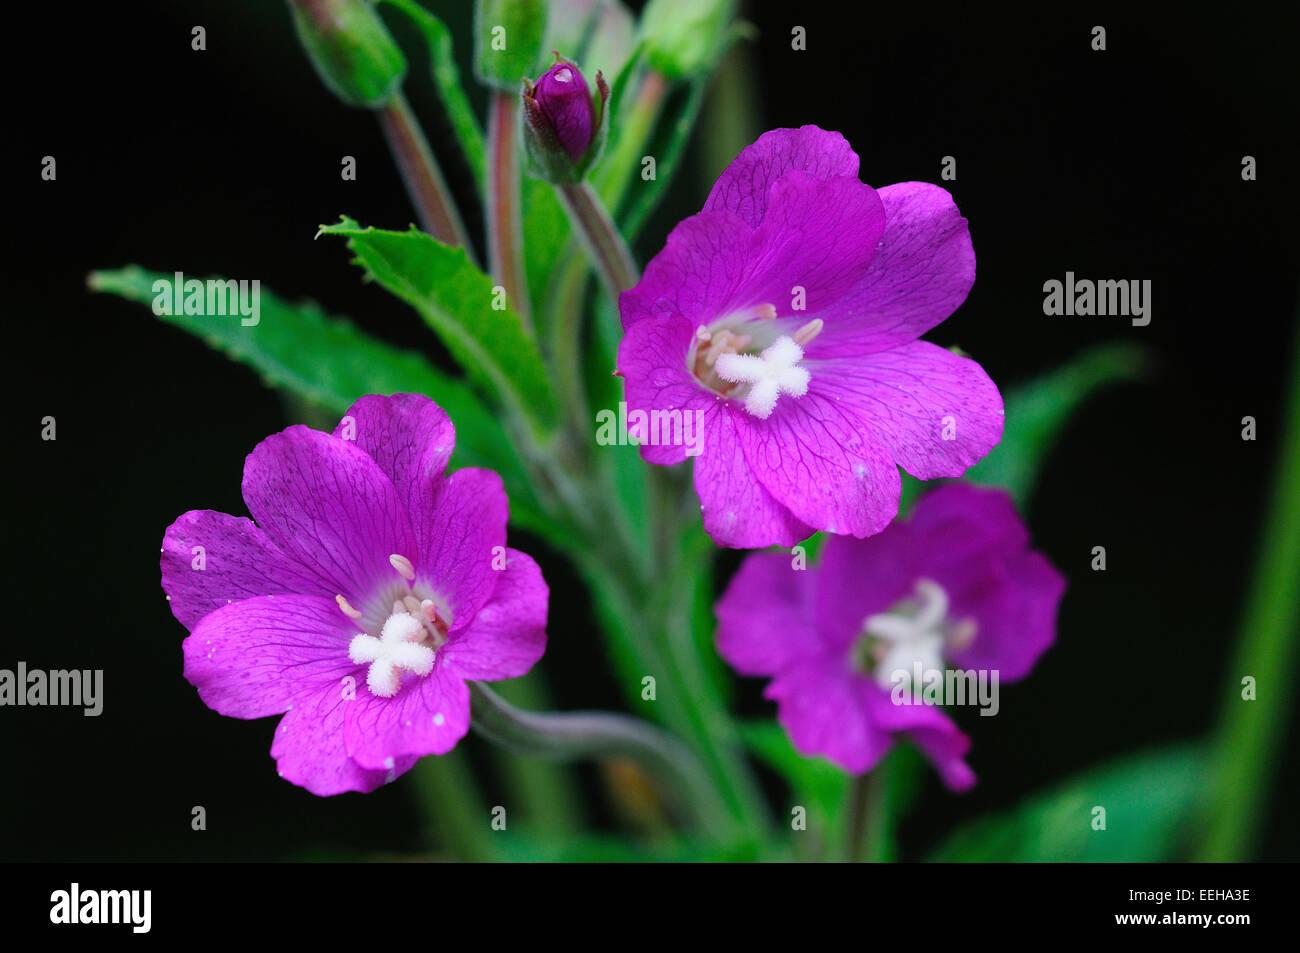 great willowherb, epilobium hirsutum - Stock Image